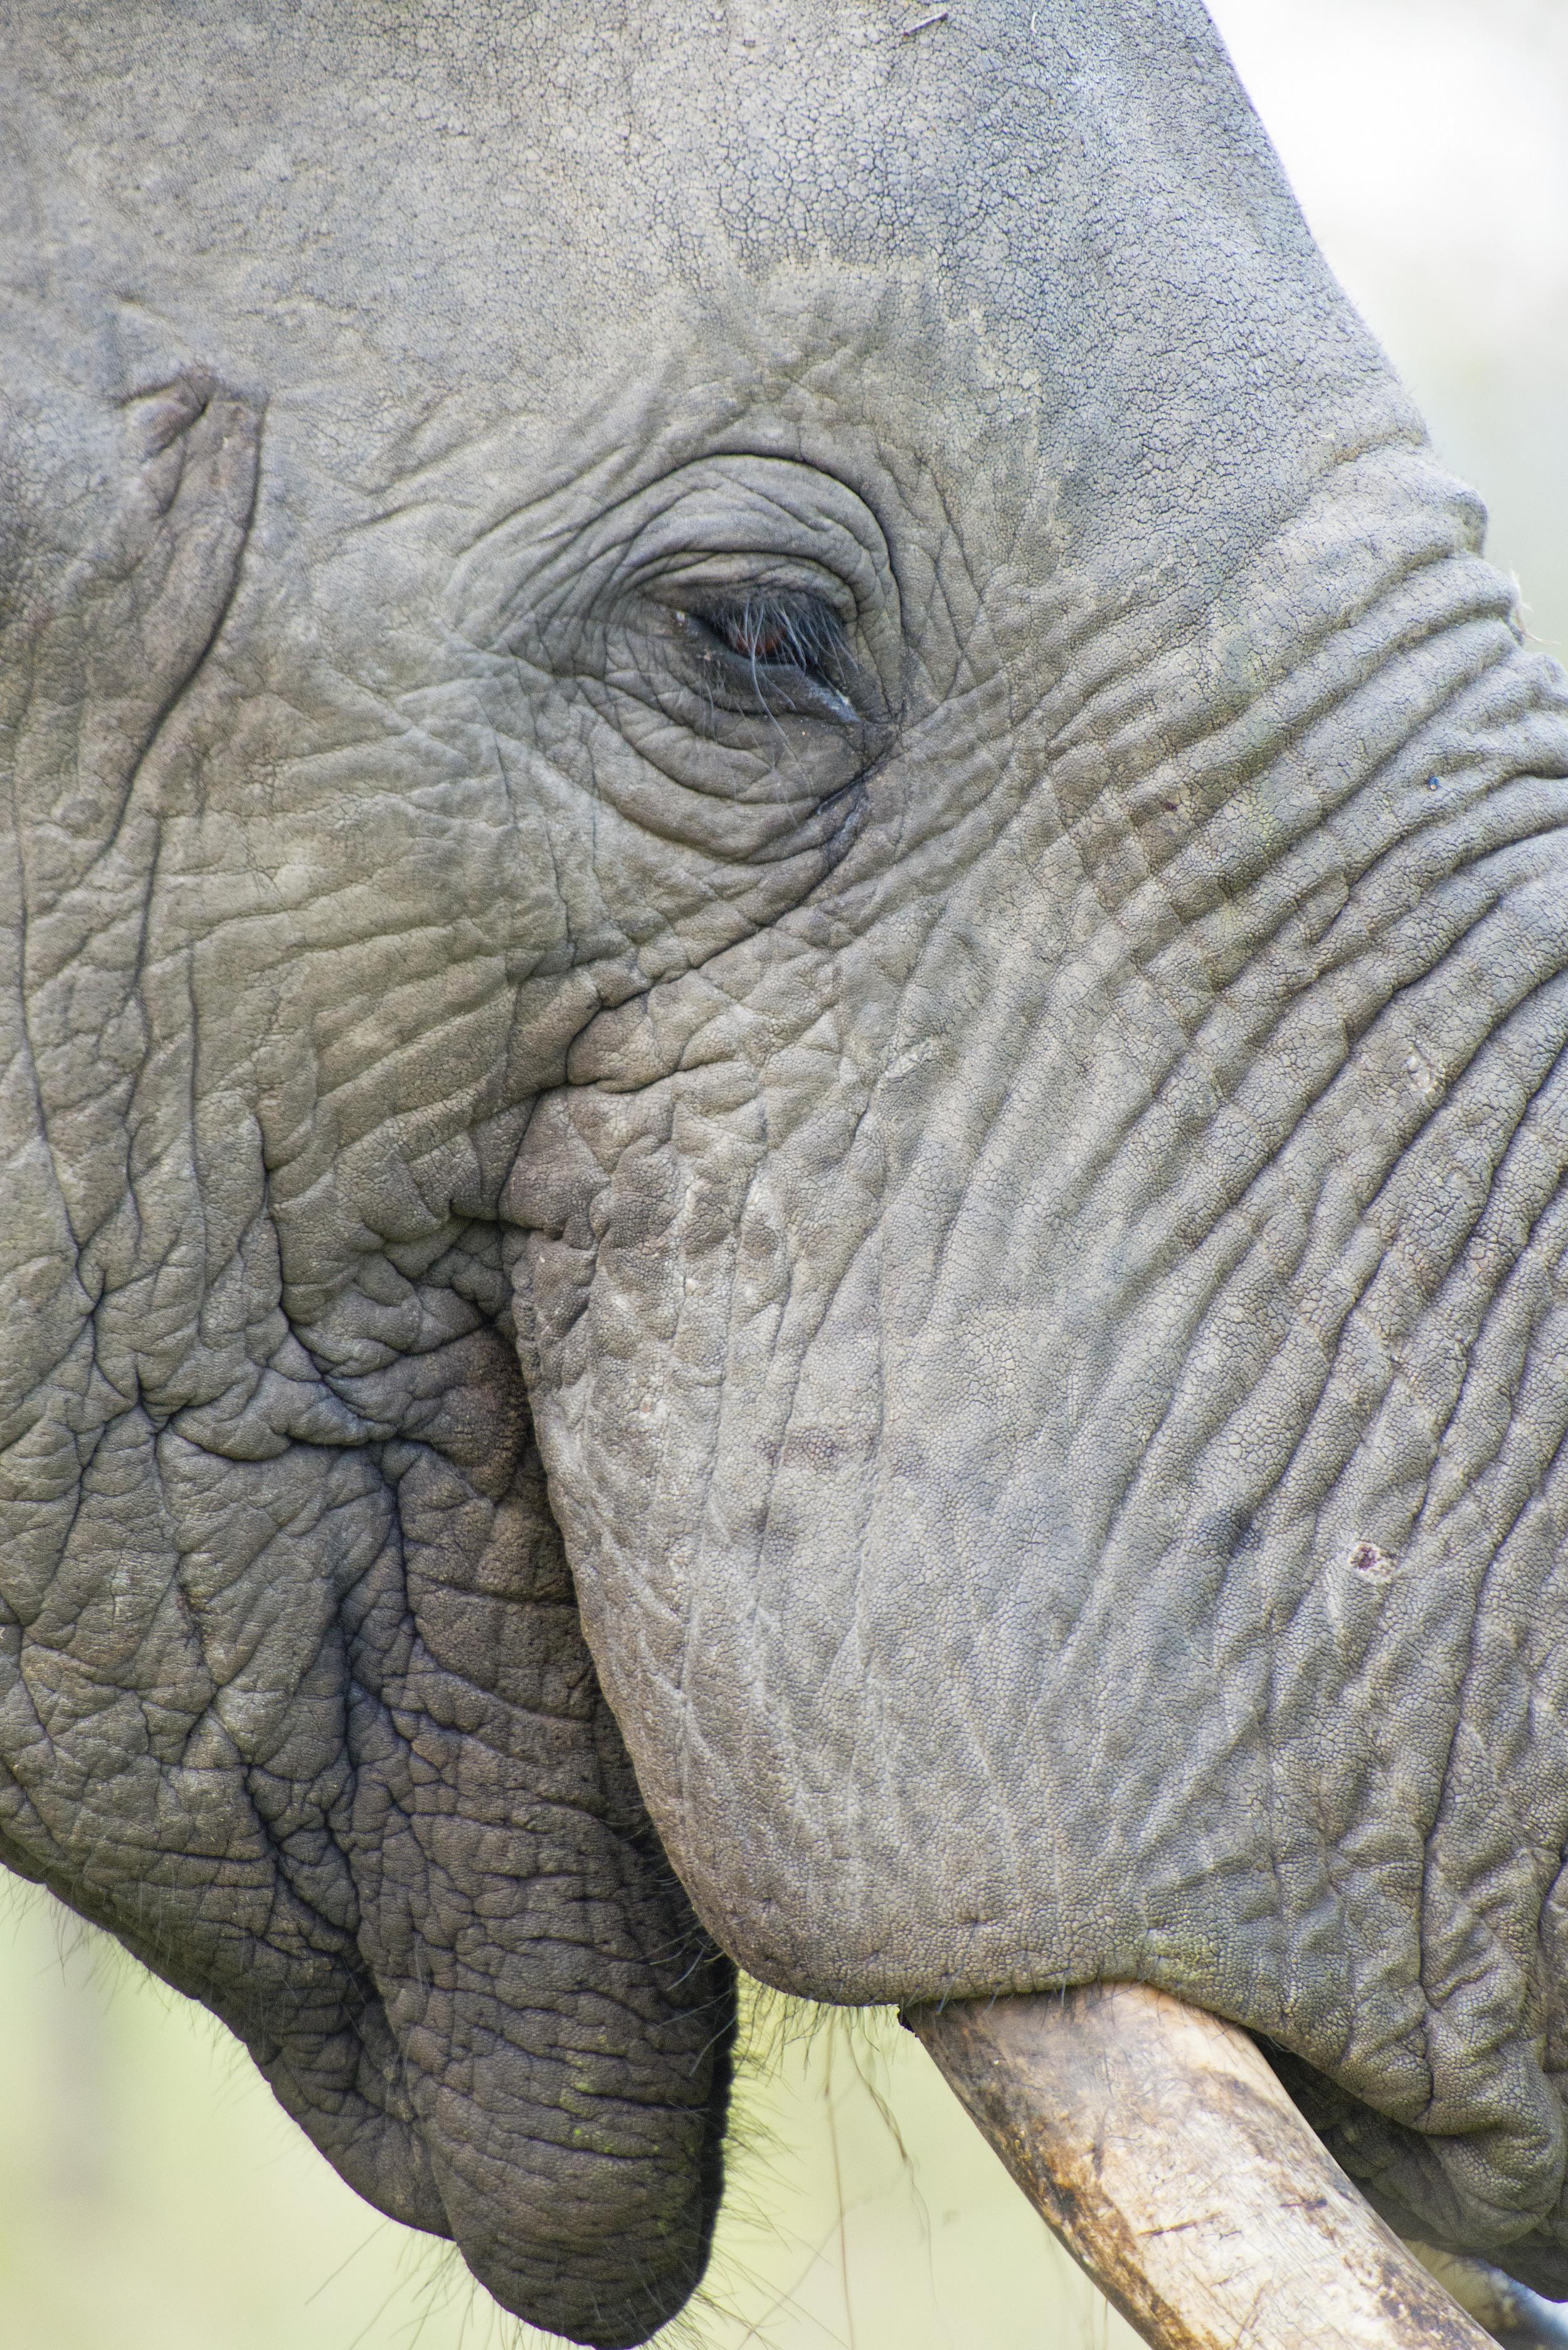 130420_DSC4521 Remarkable Elephant Portrait.jpg